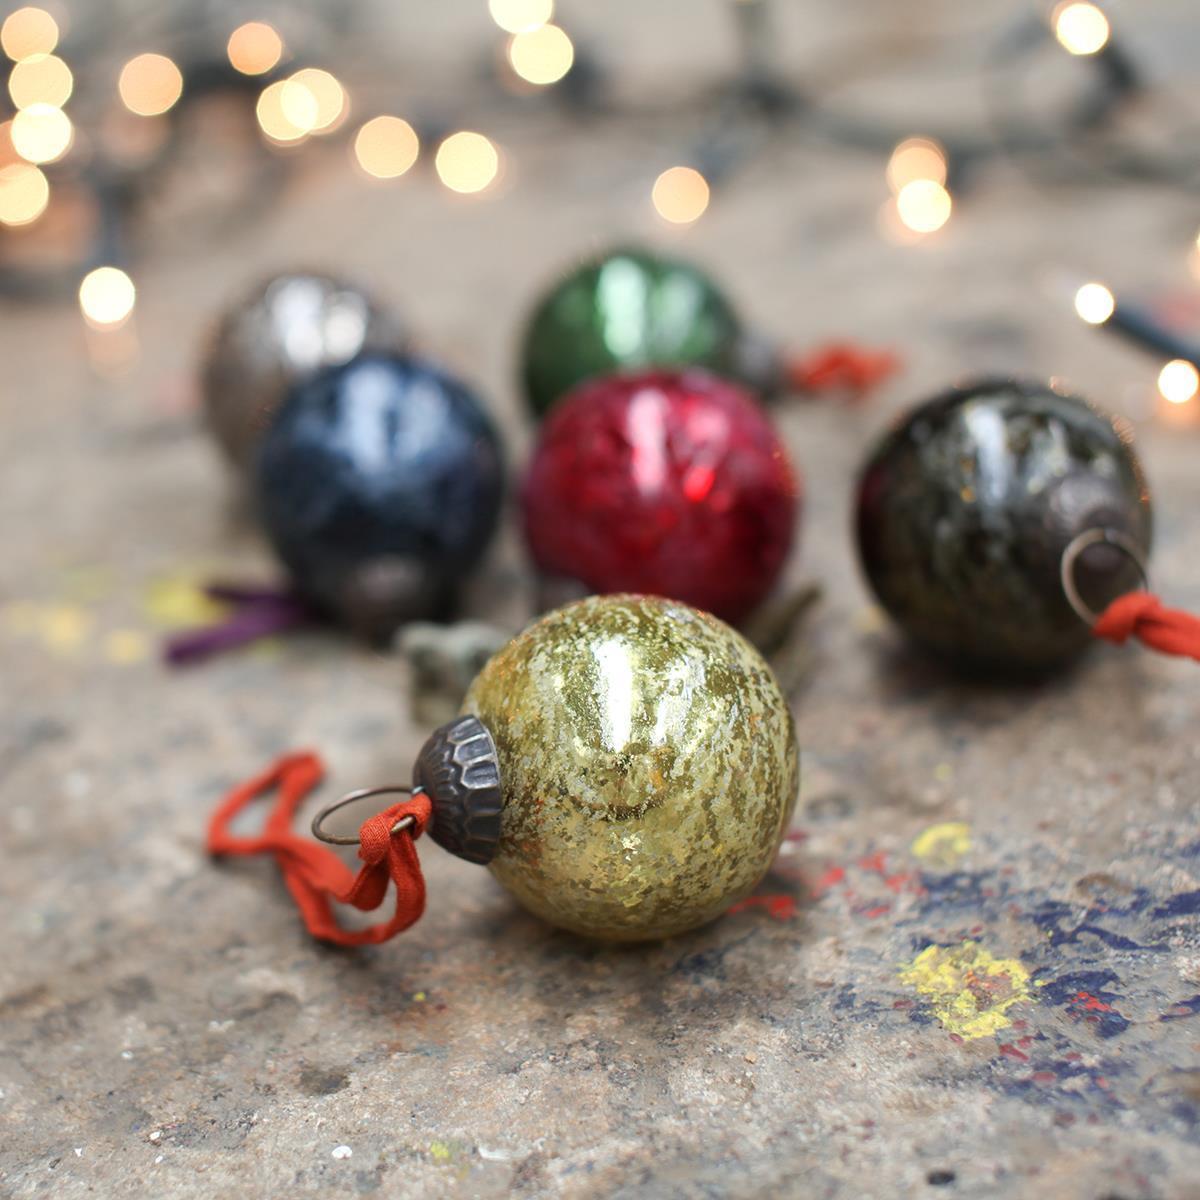 Adari_Christmas_Baubles_v1__64891.1444210351.1280.1280